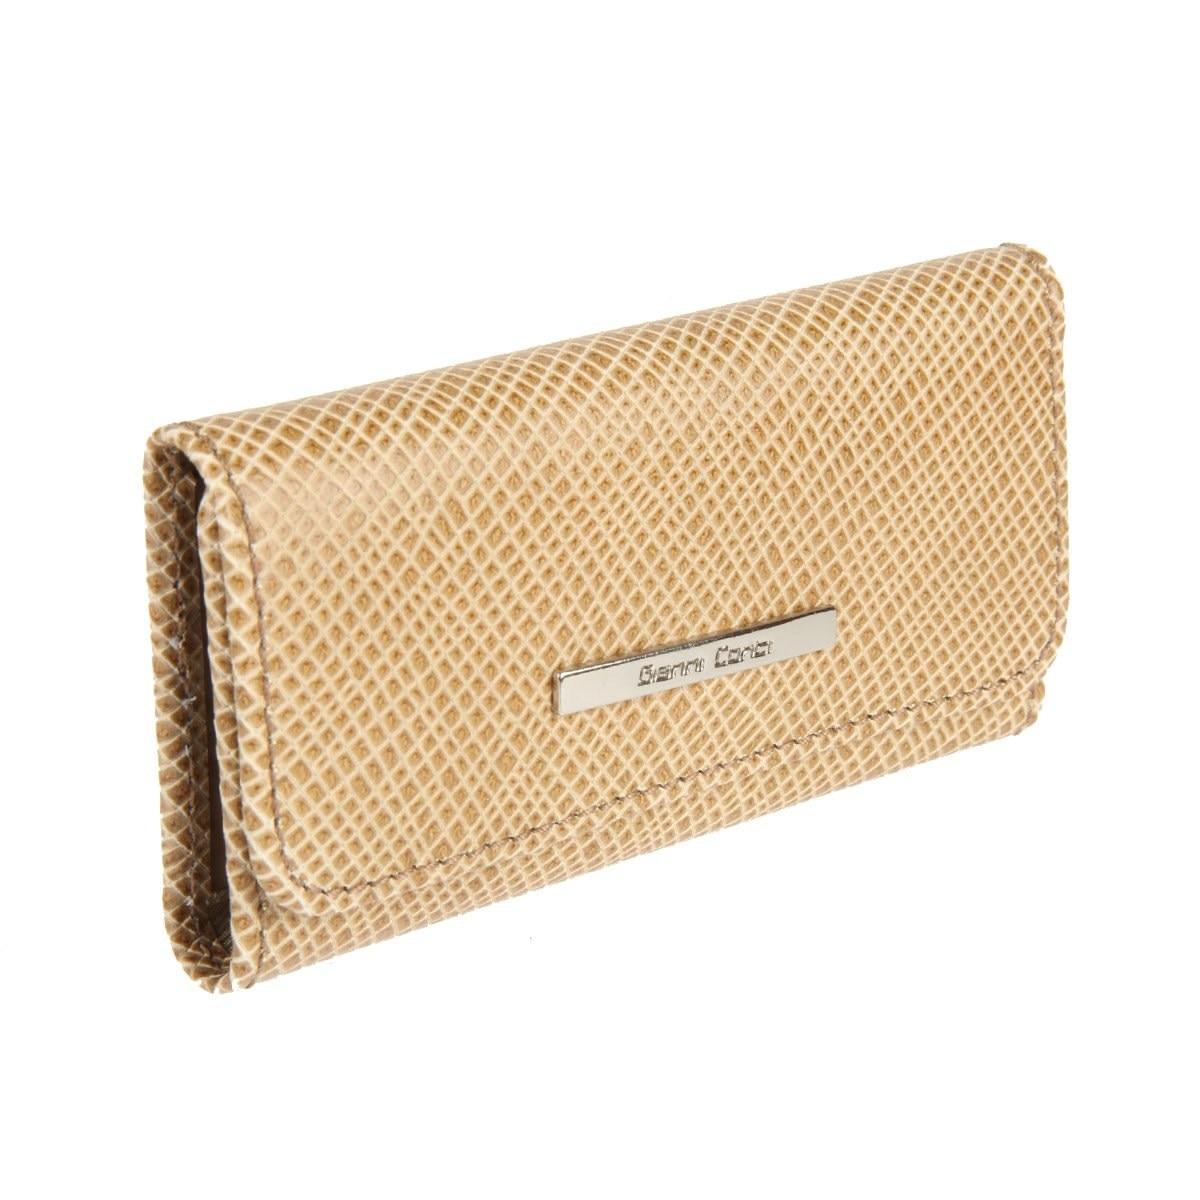 Housekeeper Gianni Conti 1879069 sand/taupe ковер bohemian 23114 taupe sand 1200х1700мм